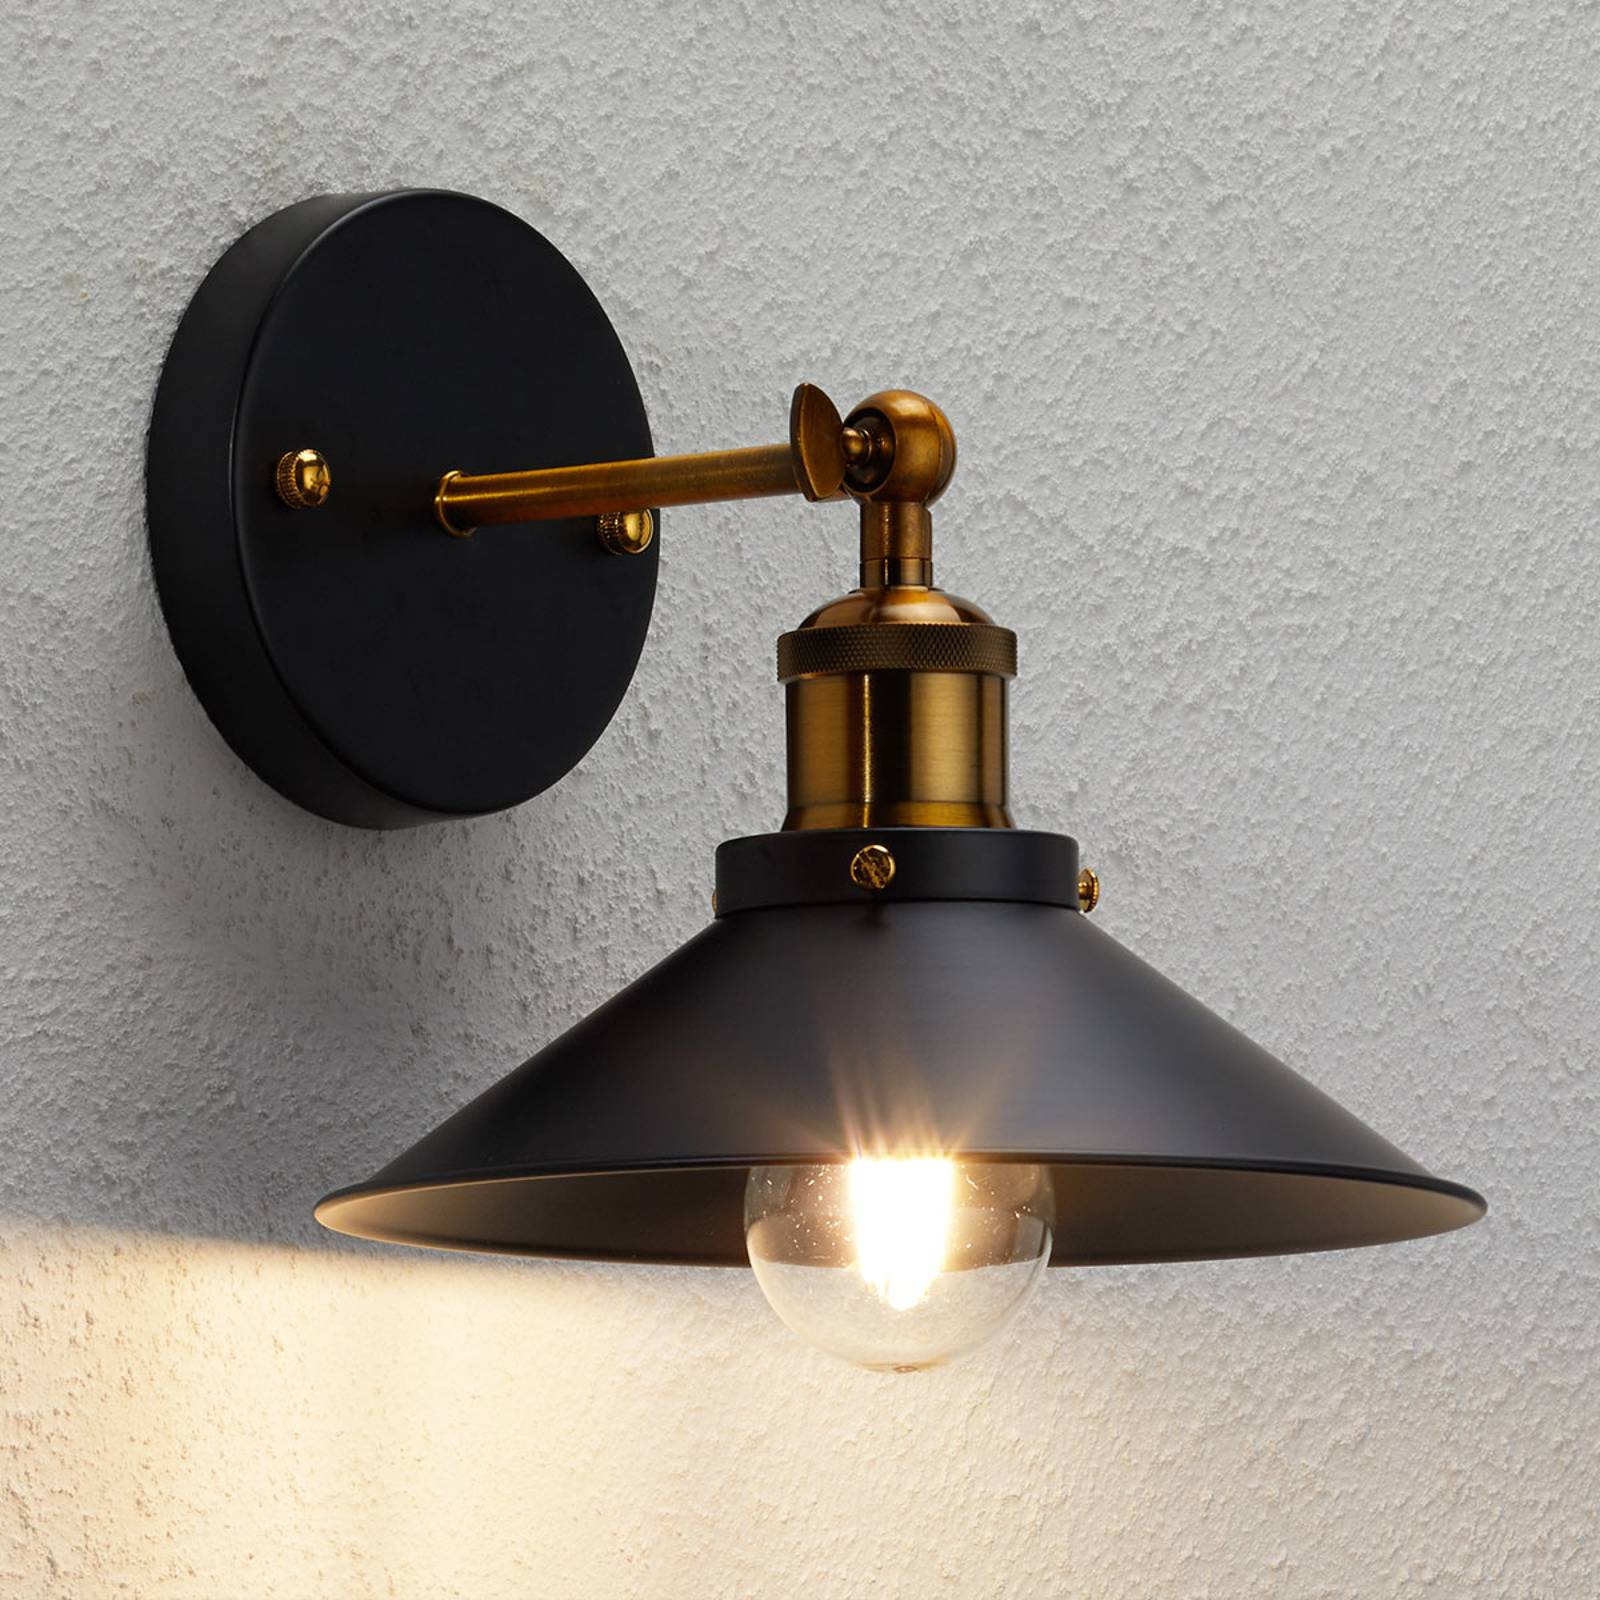 Wandlamp Viktor in industrieel ontwerp